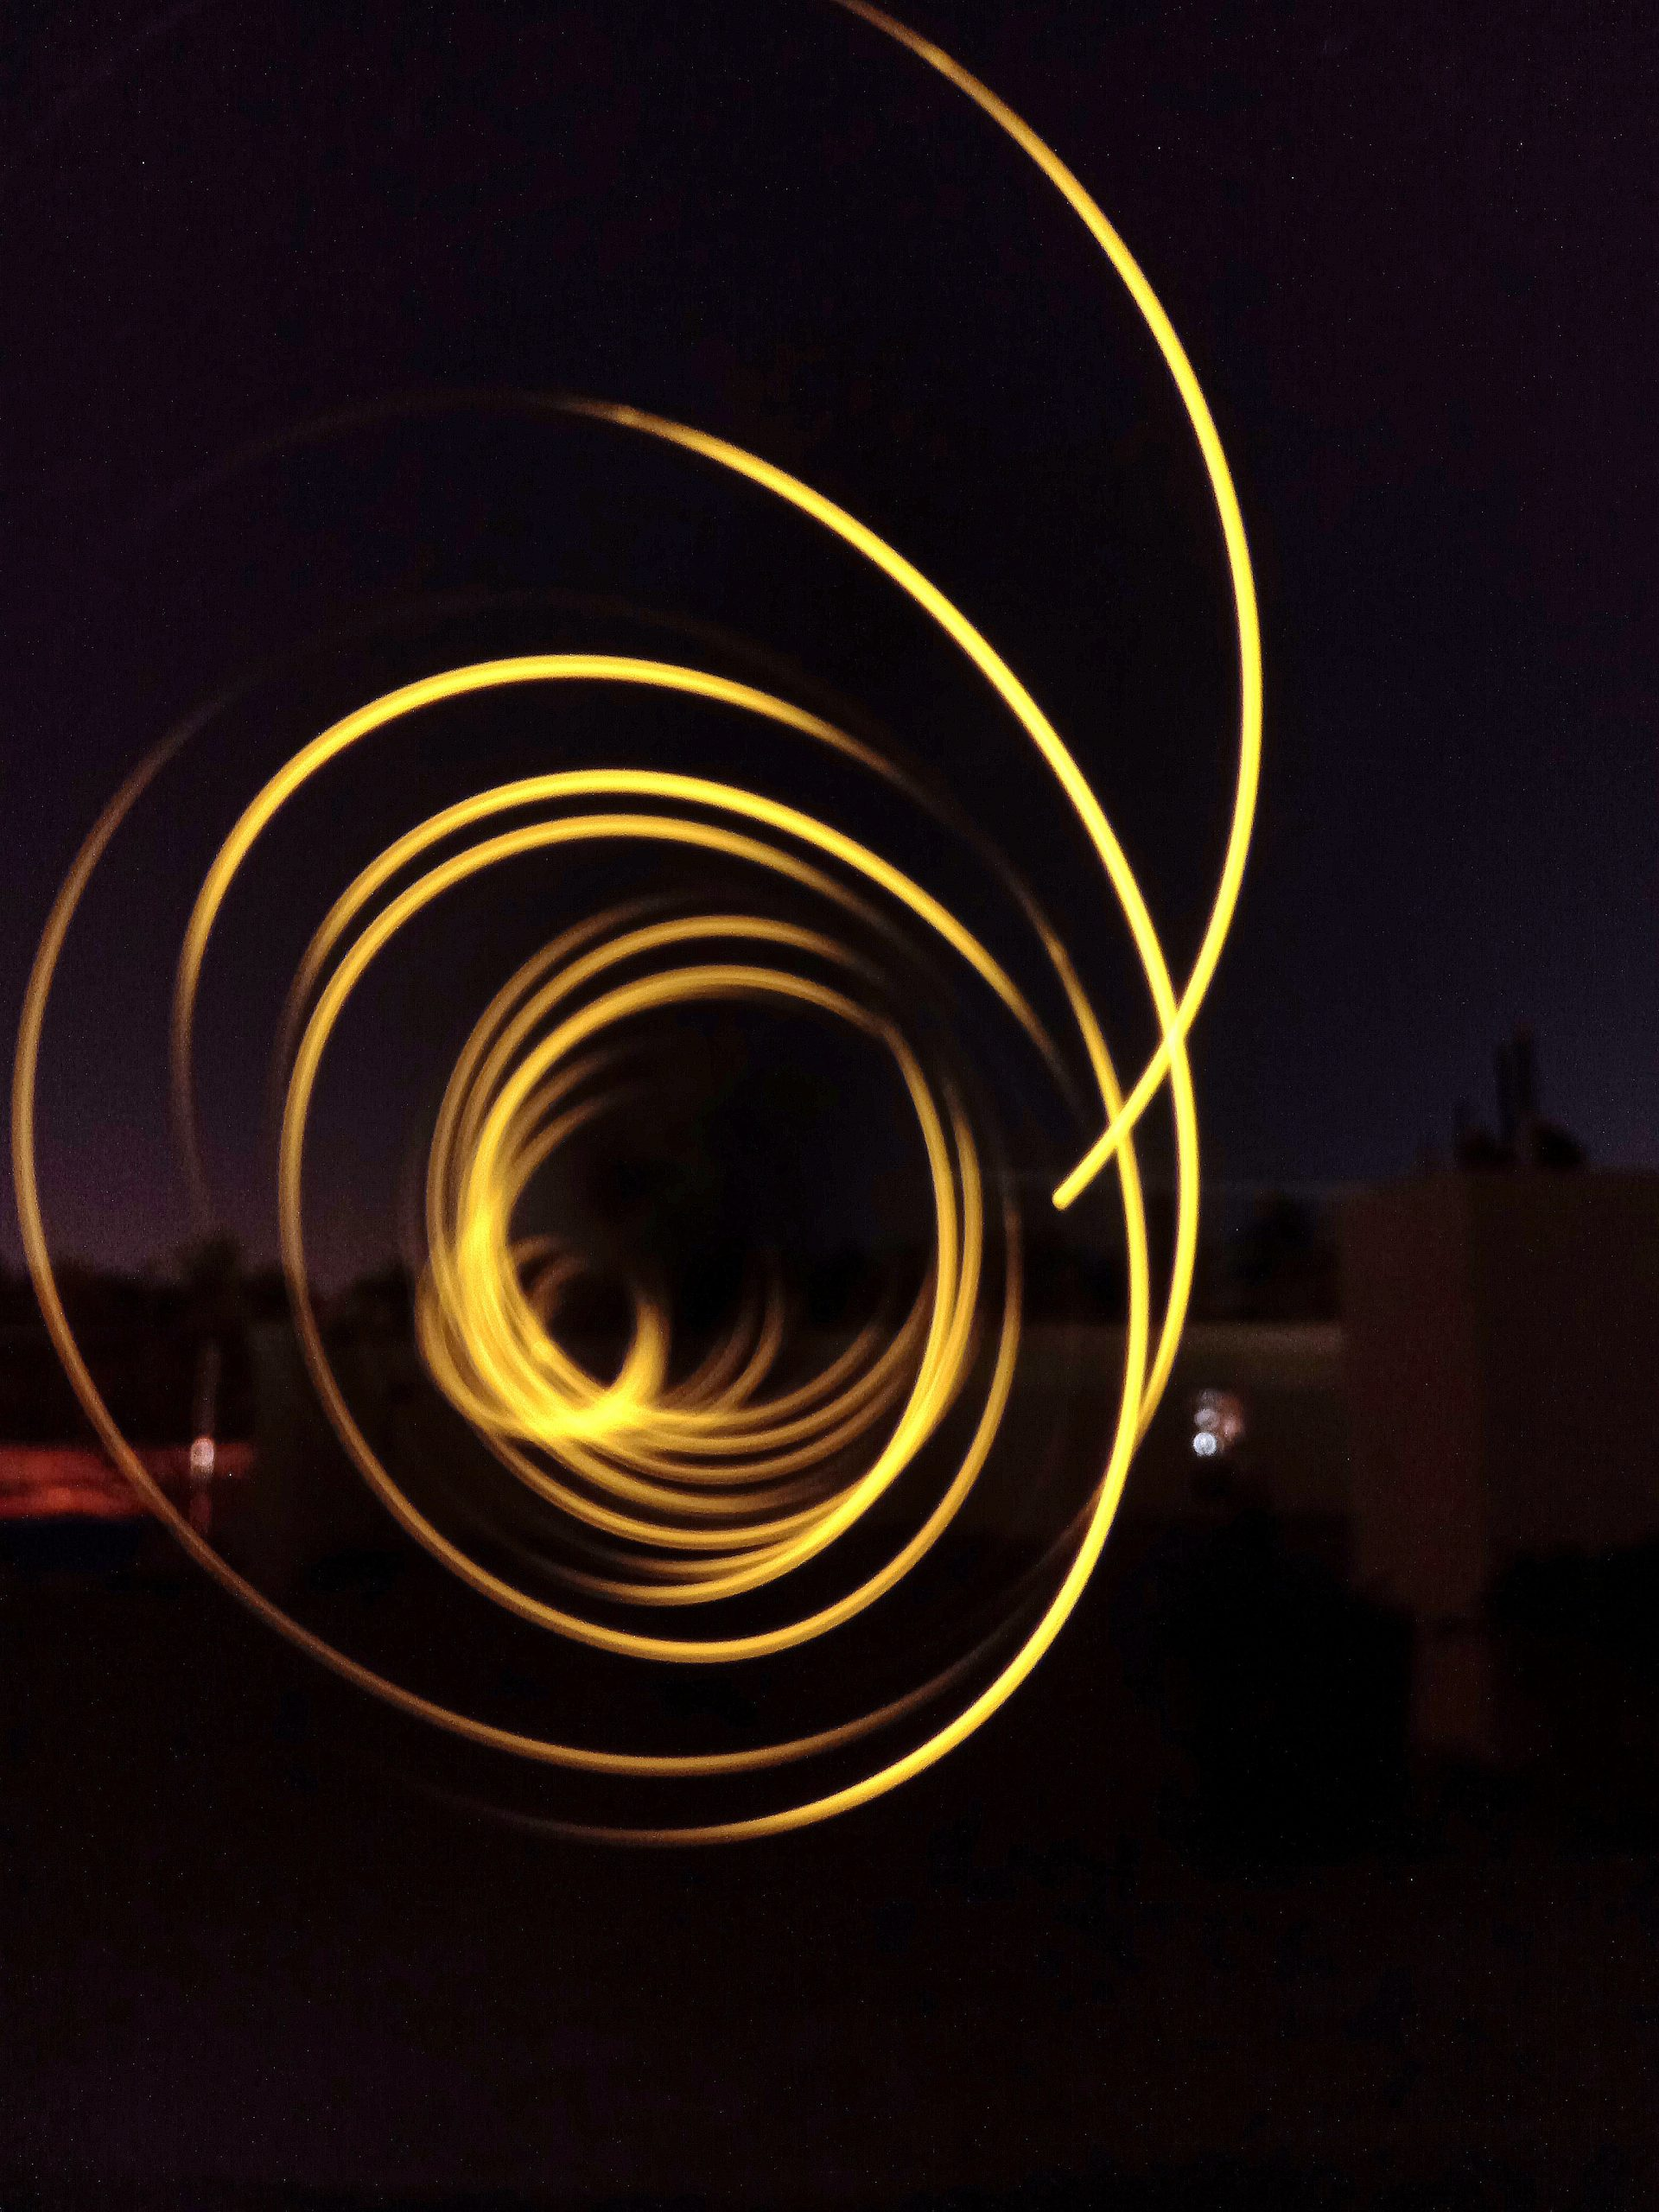 Spiral light trails